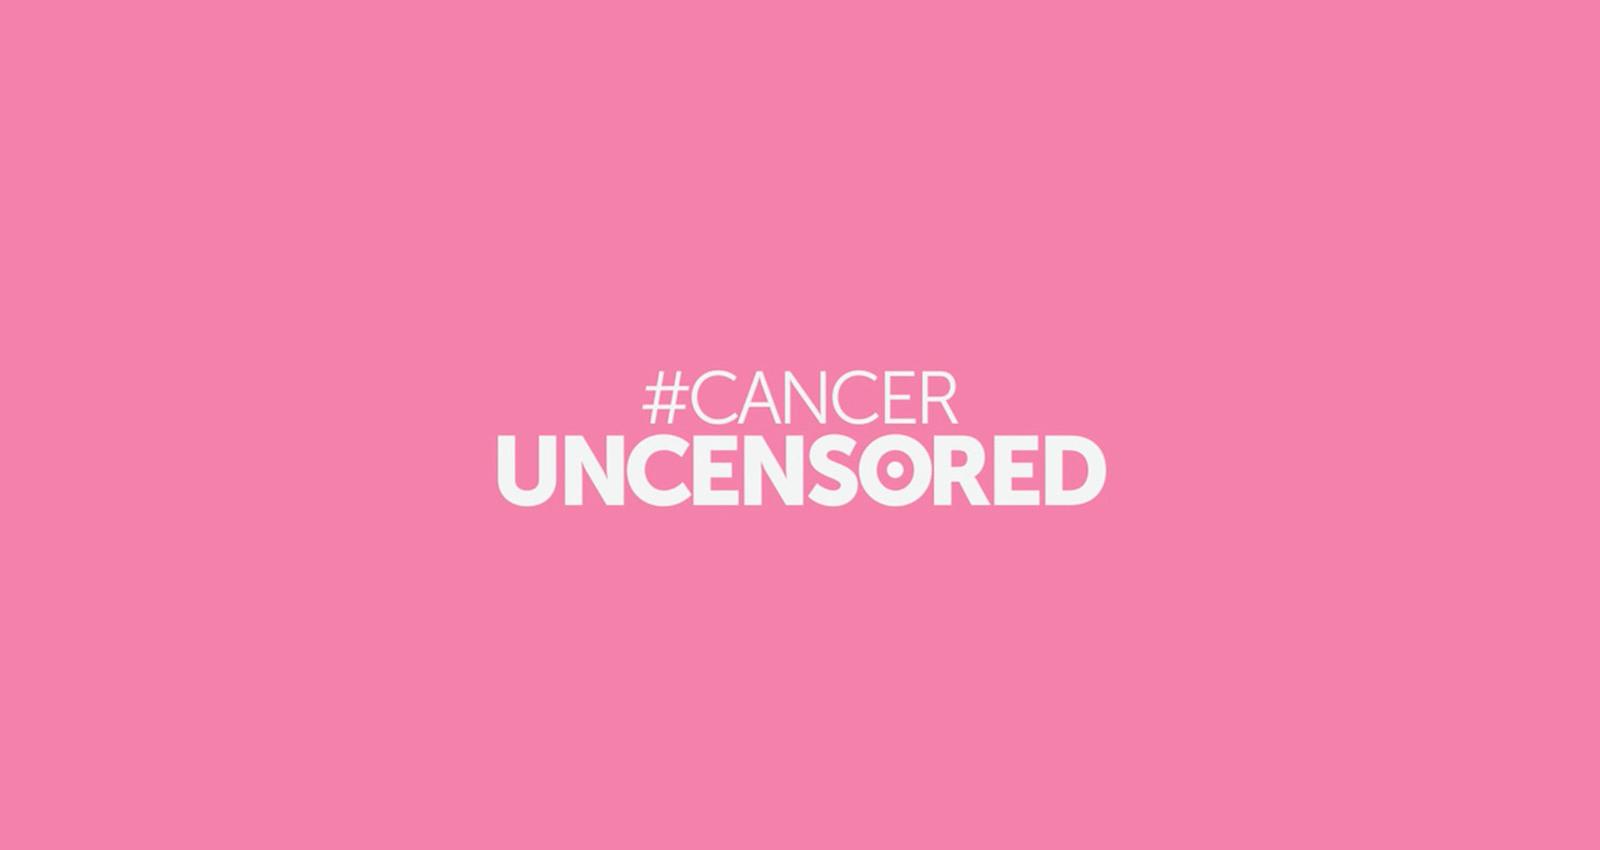 Cancer Uncensored